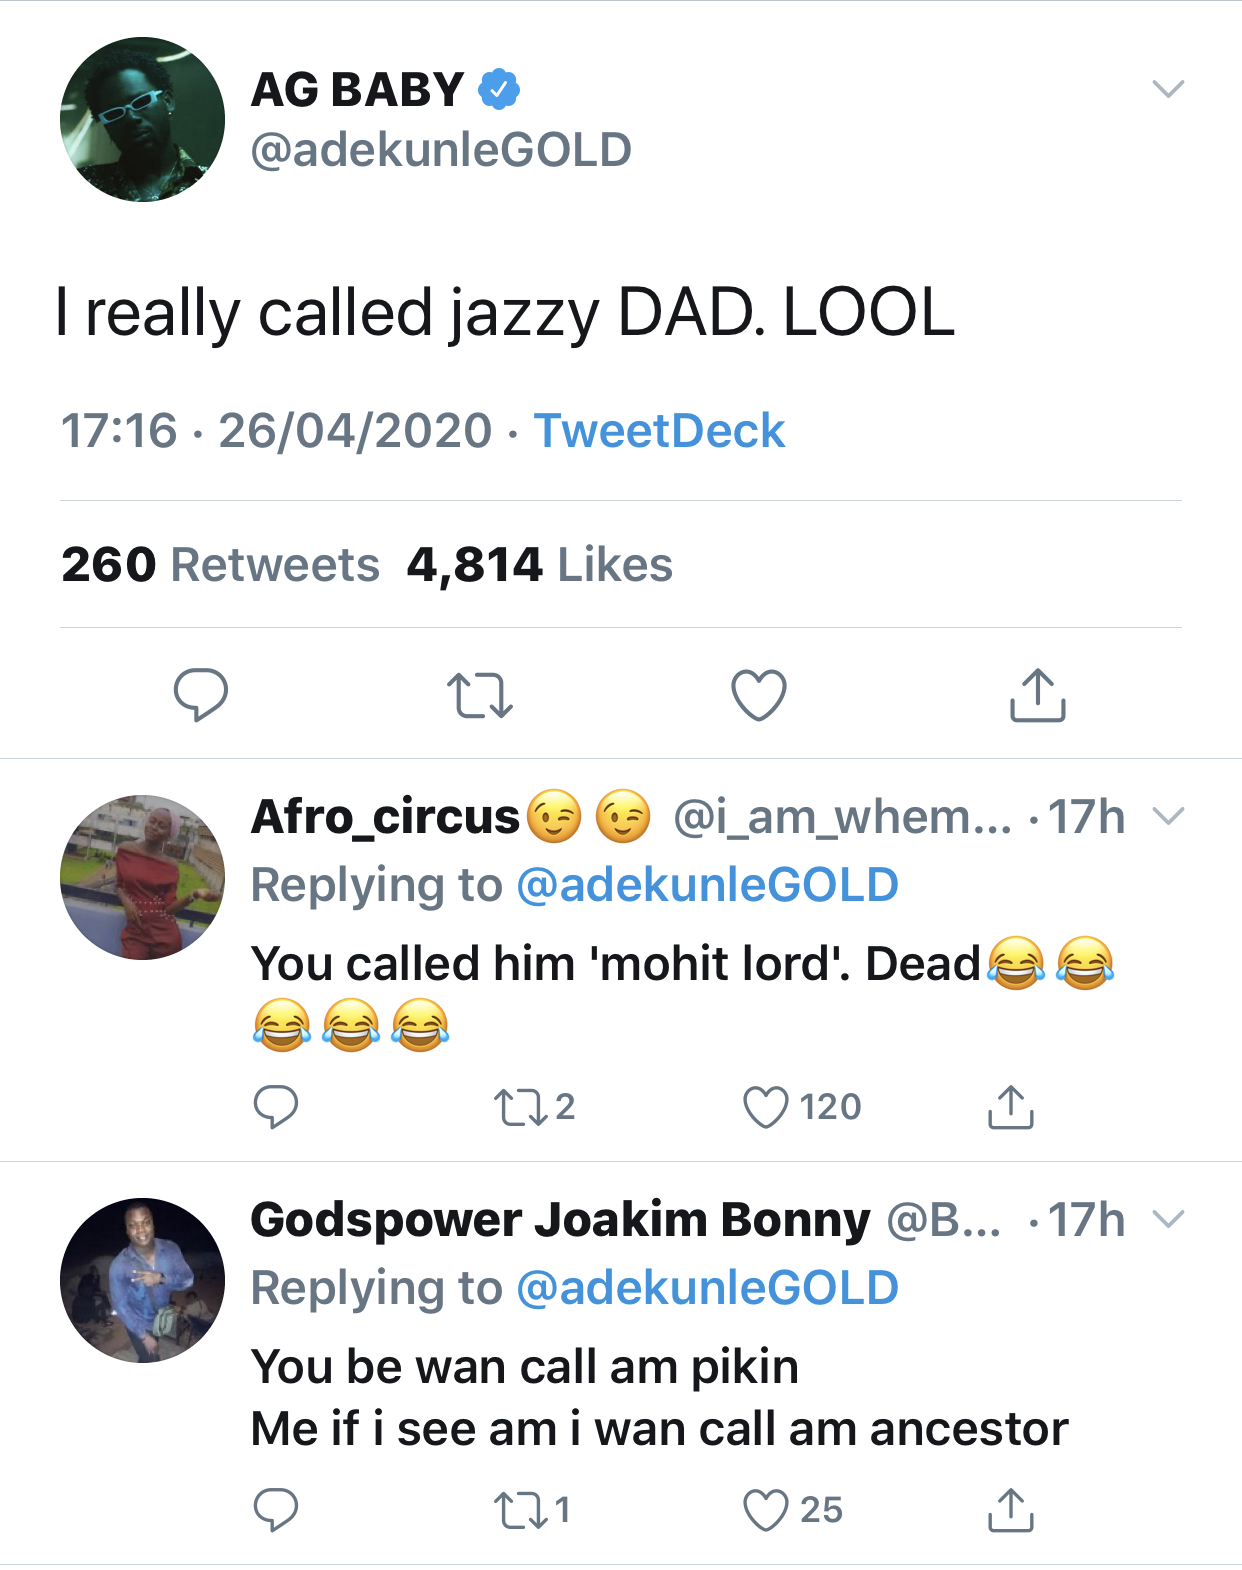 Adekunle Gold's tweet